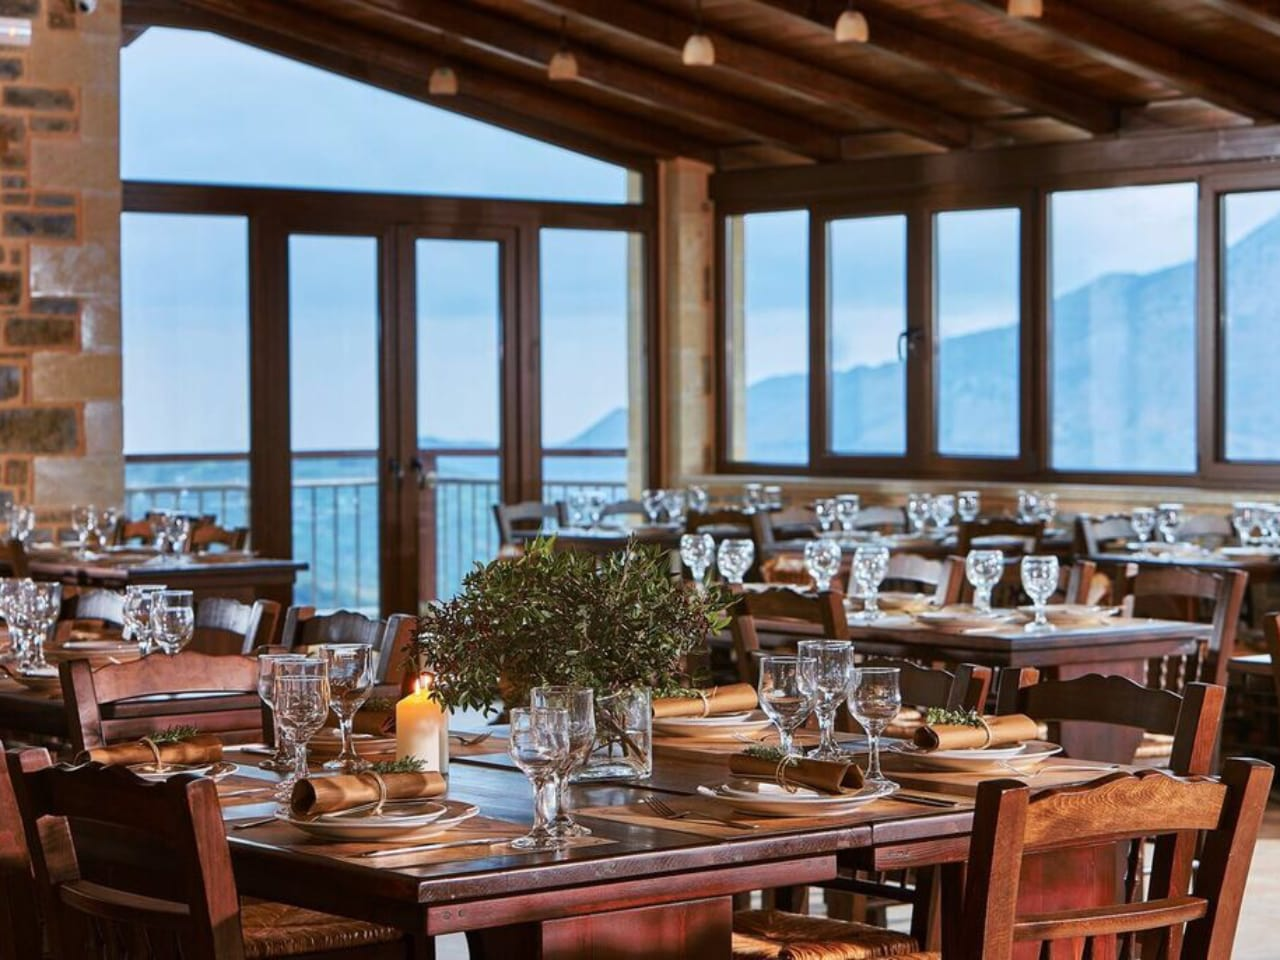 Iperoon Restaurant Axos Village, yakinthos restaurant axos village, where to eat near rethimno, axos village tavern, best restaurants rethymno crete